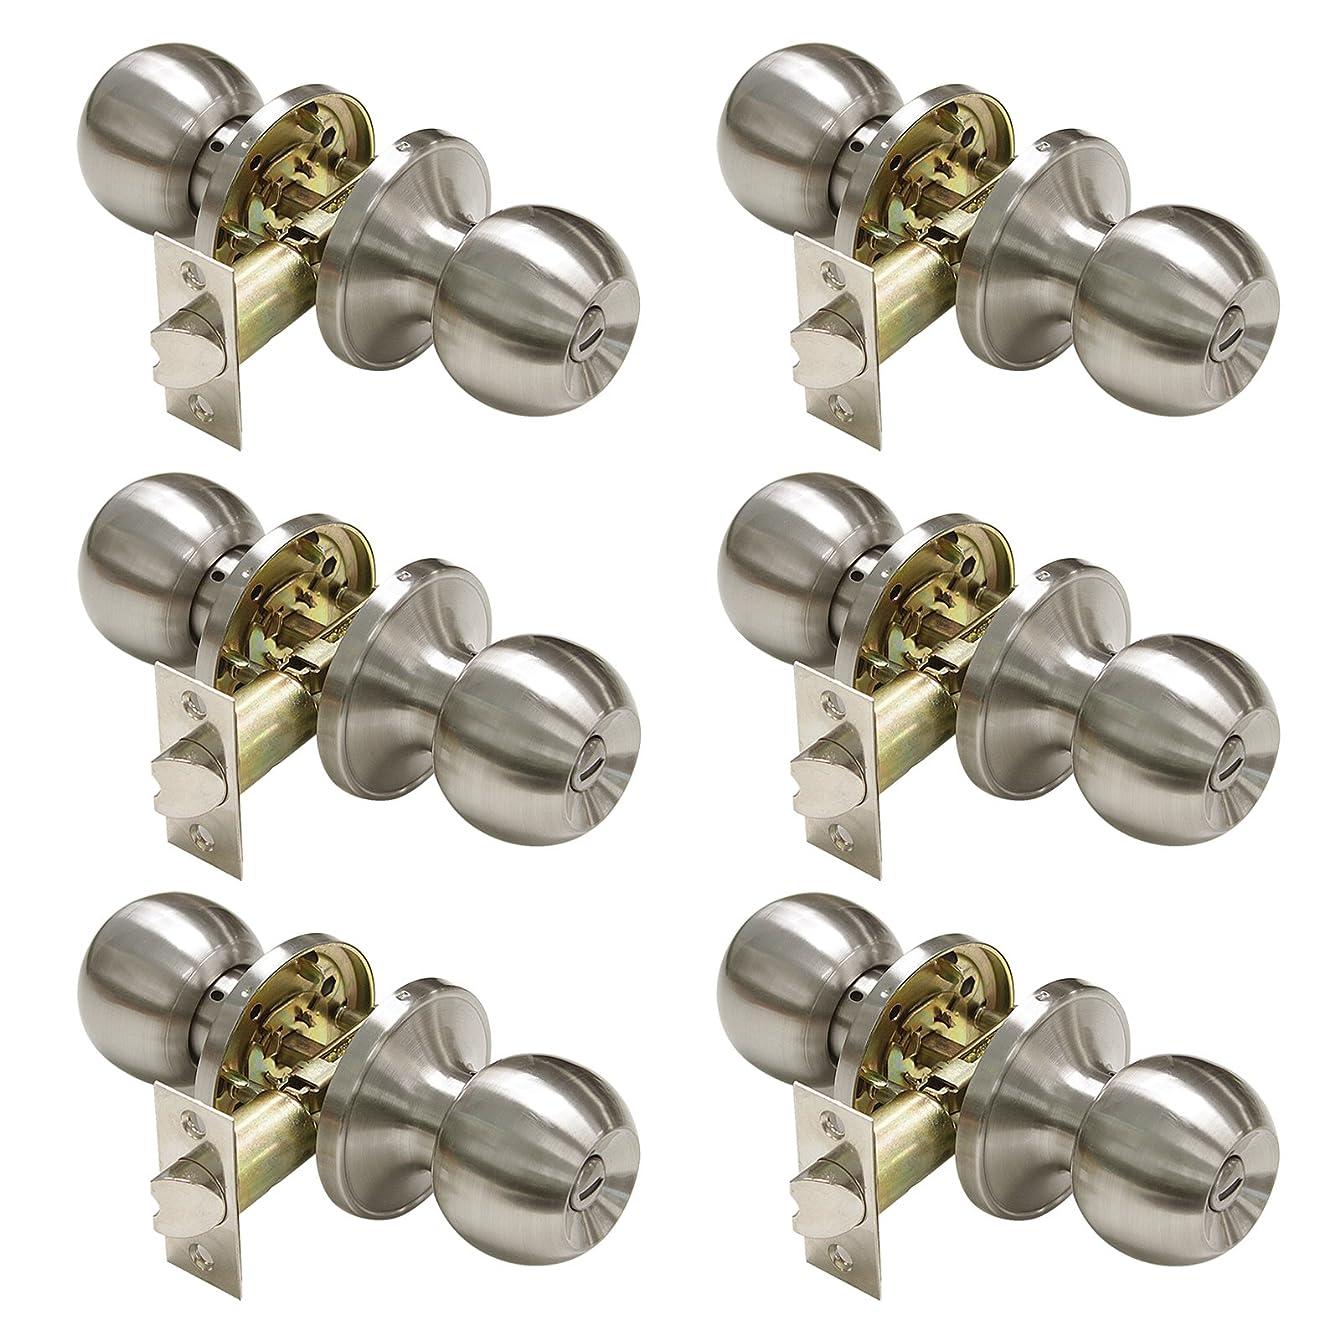 Privacy Door Lock Storage Room Bathroom Keyless Lockset HM6-07 Round Knob set,Brushed Satin Nickel, 6pack